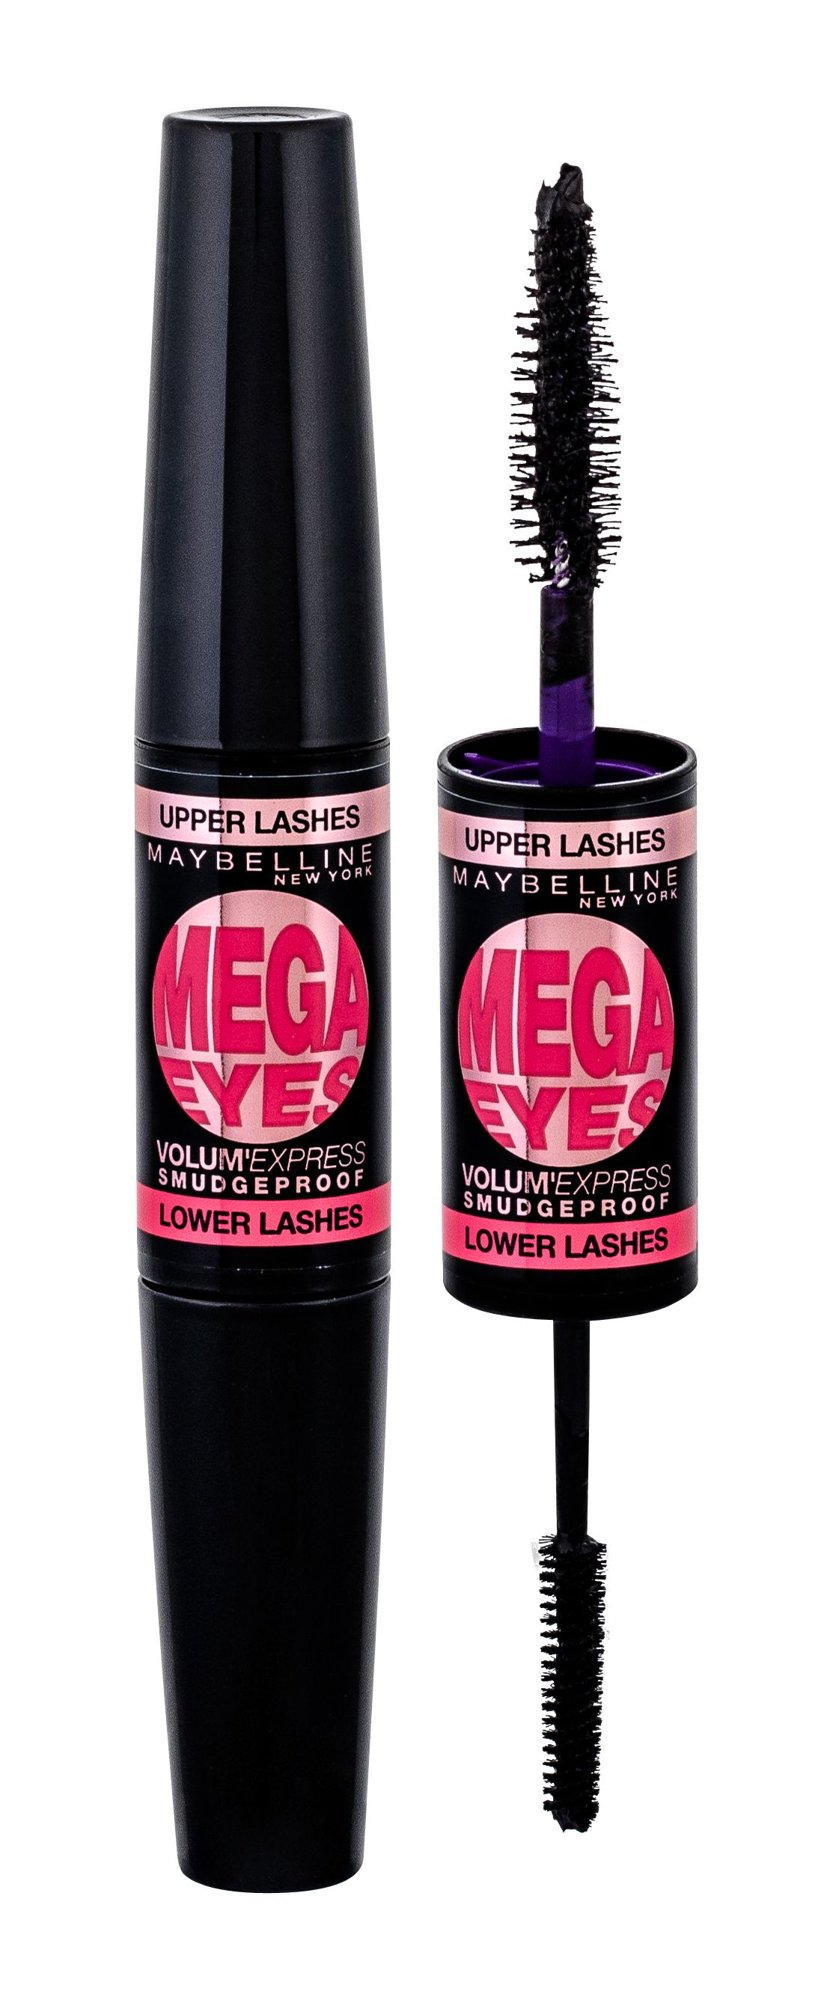 Maybelline Mega Eyes Volum Express Mascara 9,7ml Black